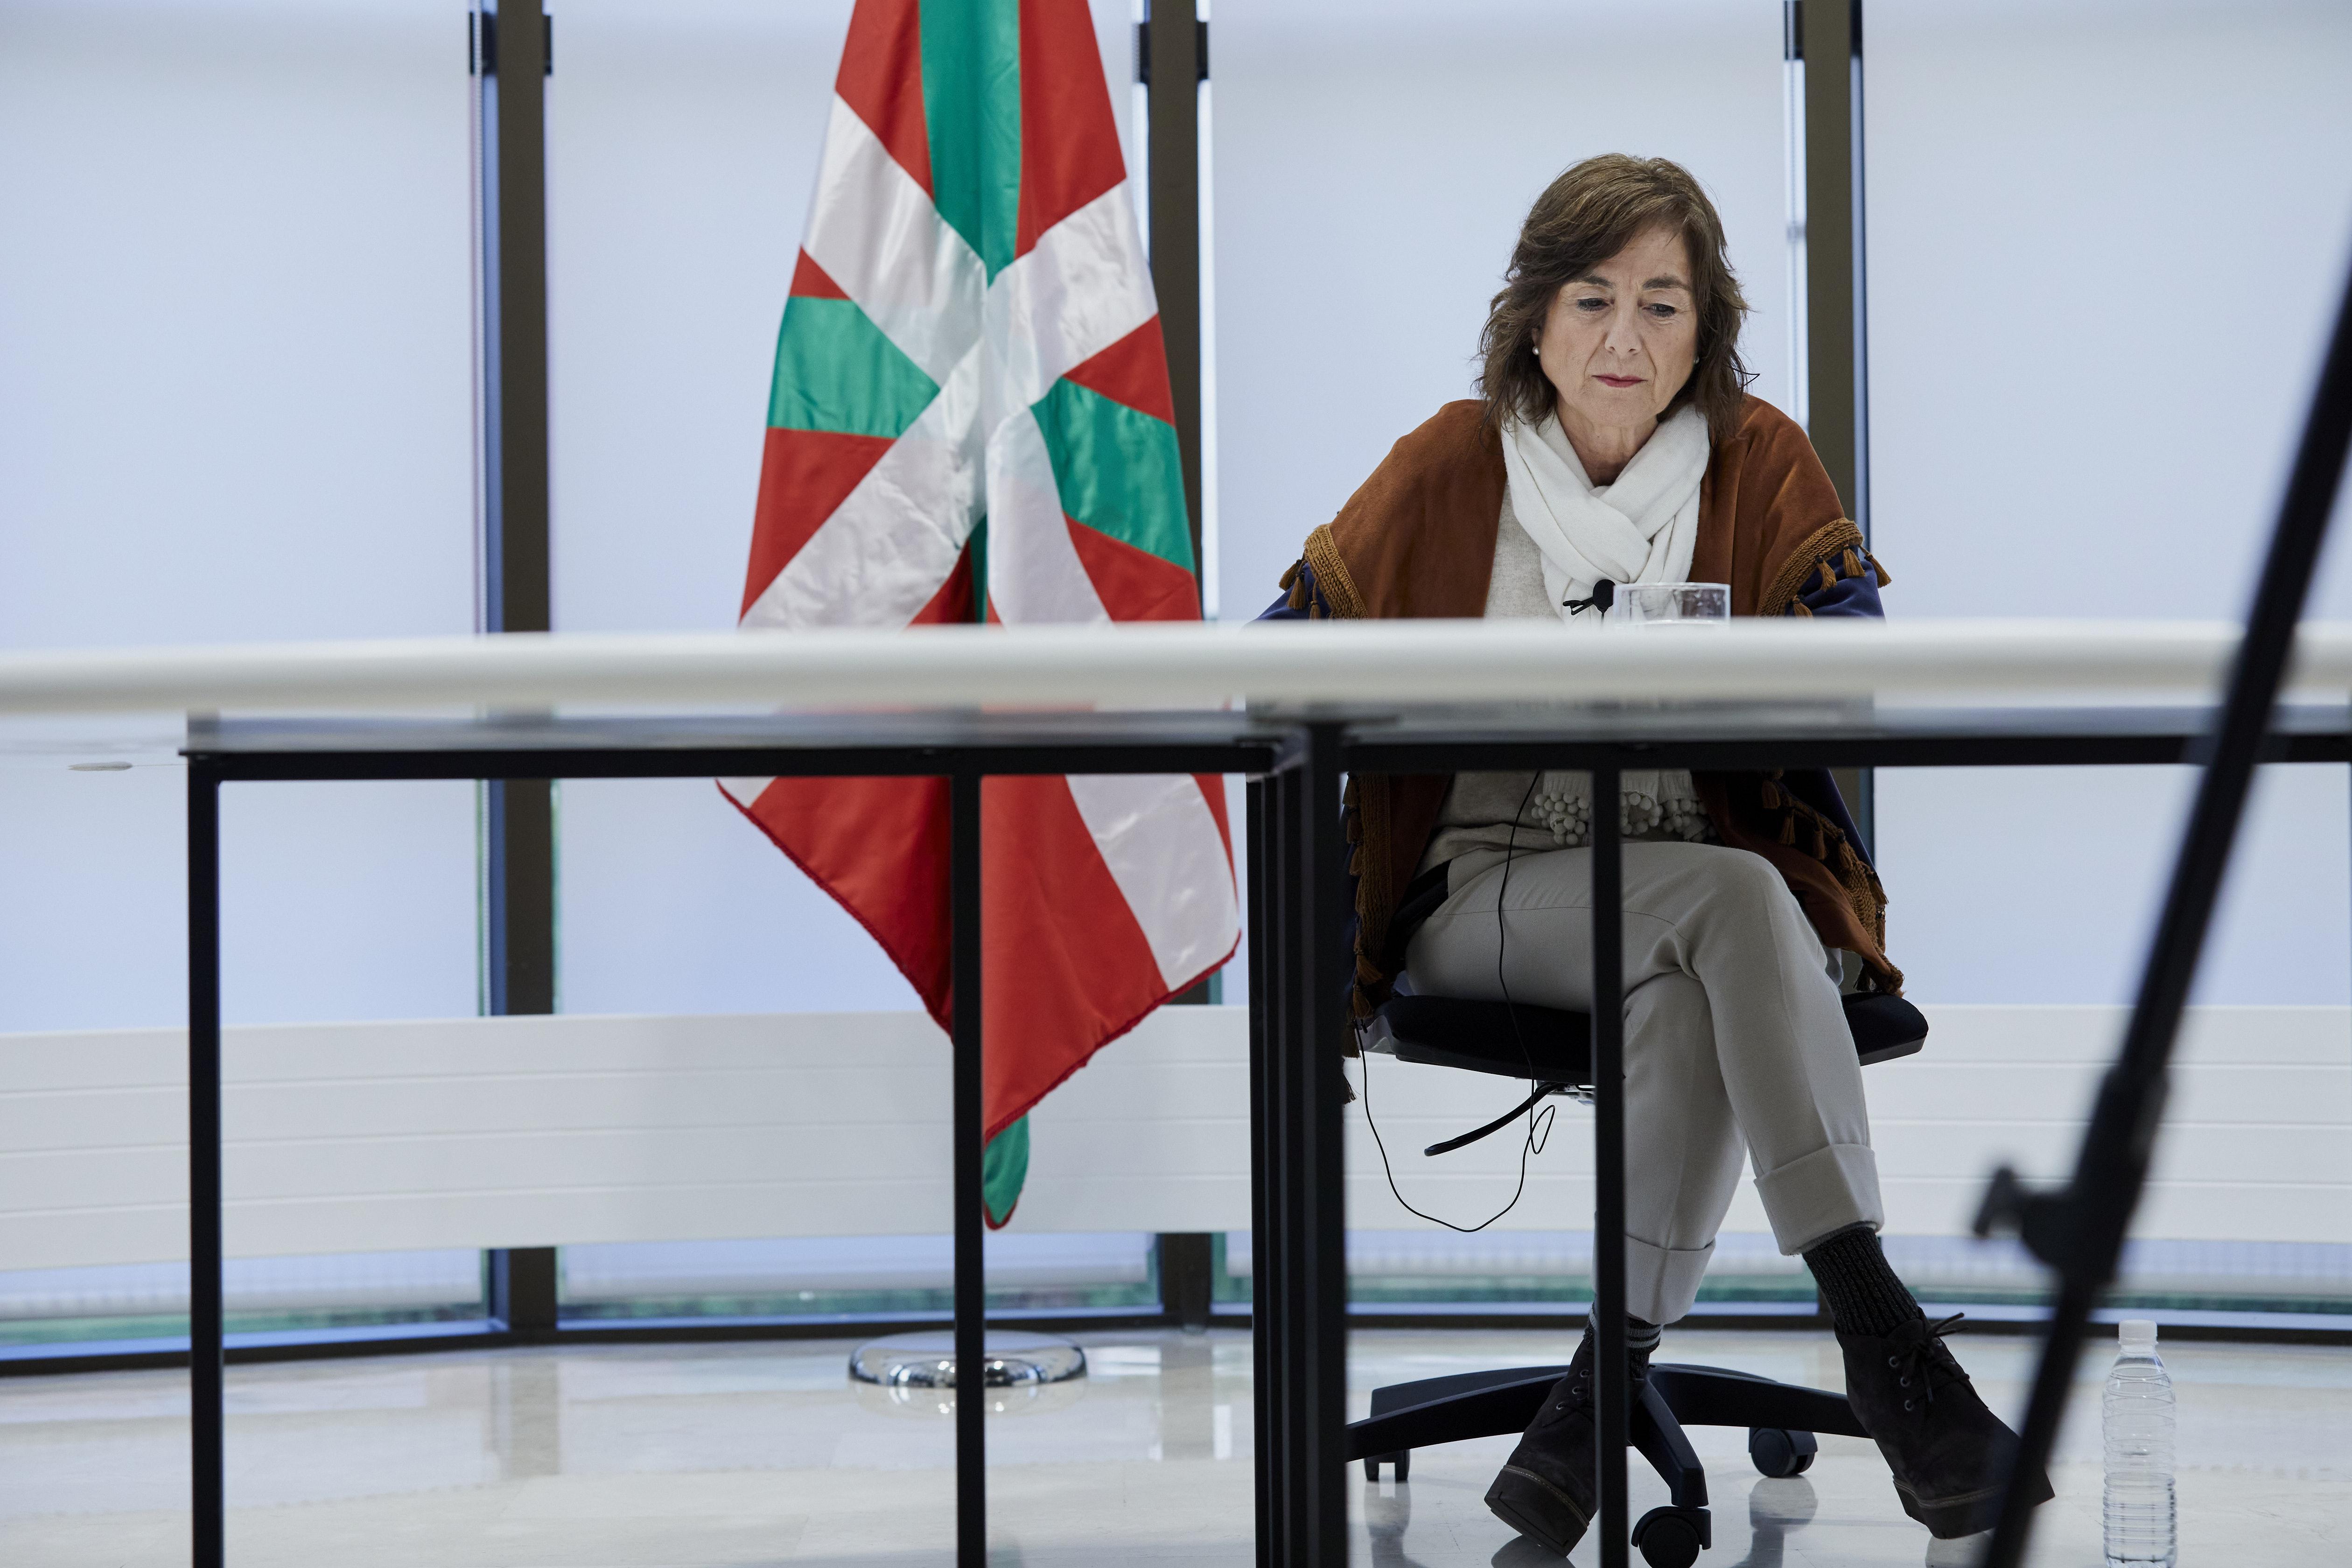 2020.04.08_Uriarte_Euskadi_Irratia_011.jpg